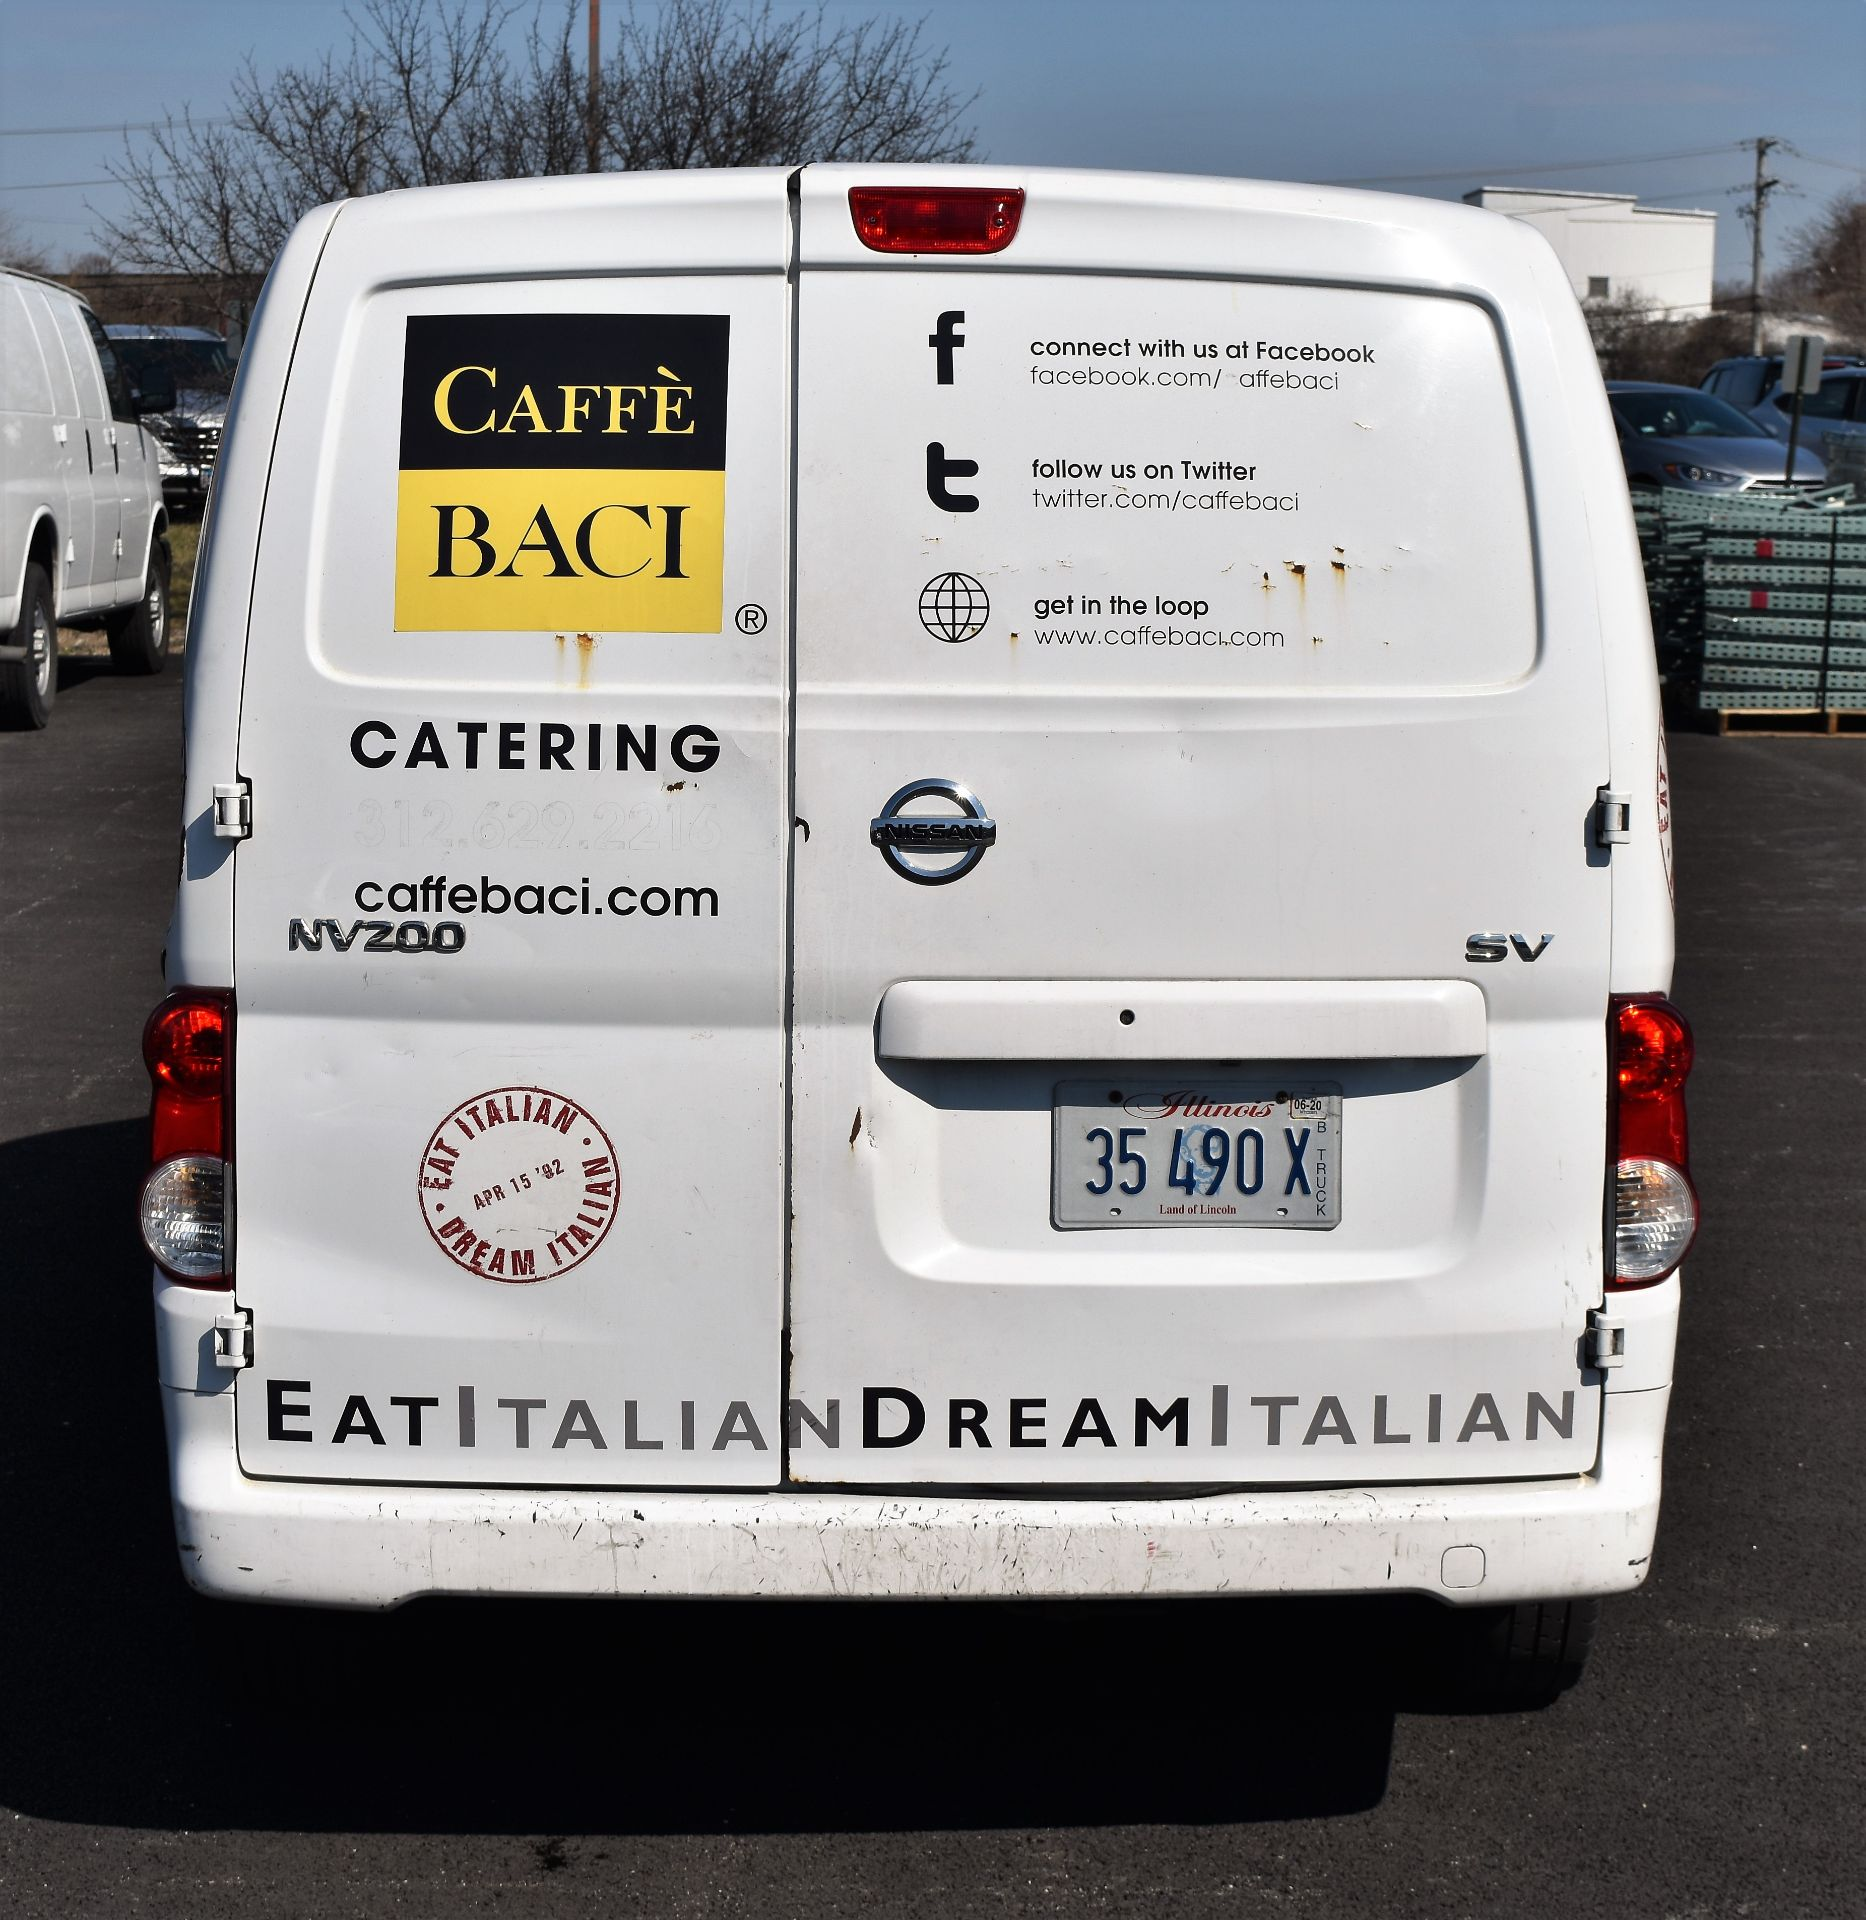 2013 Nissan NV200 Delivery Van - Image 50 of 54